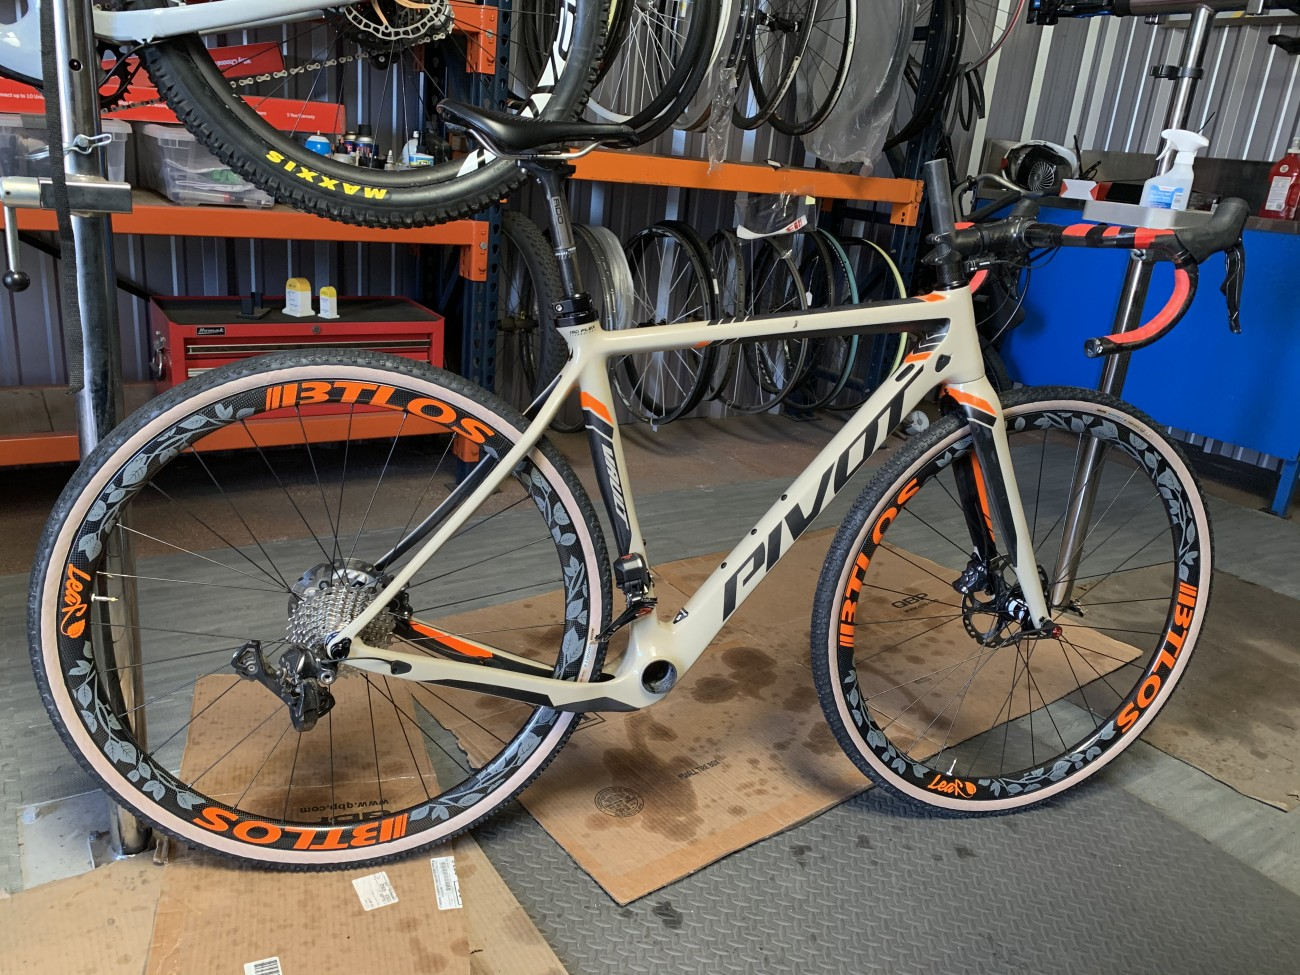 Carbon wheels with orange BTLOS and gray leaf decal